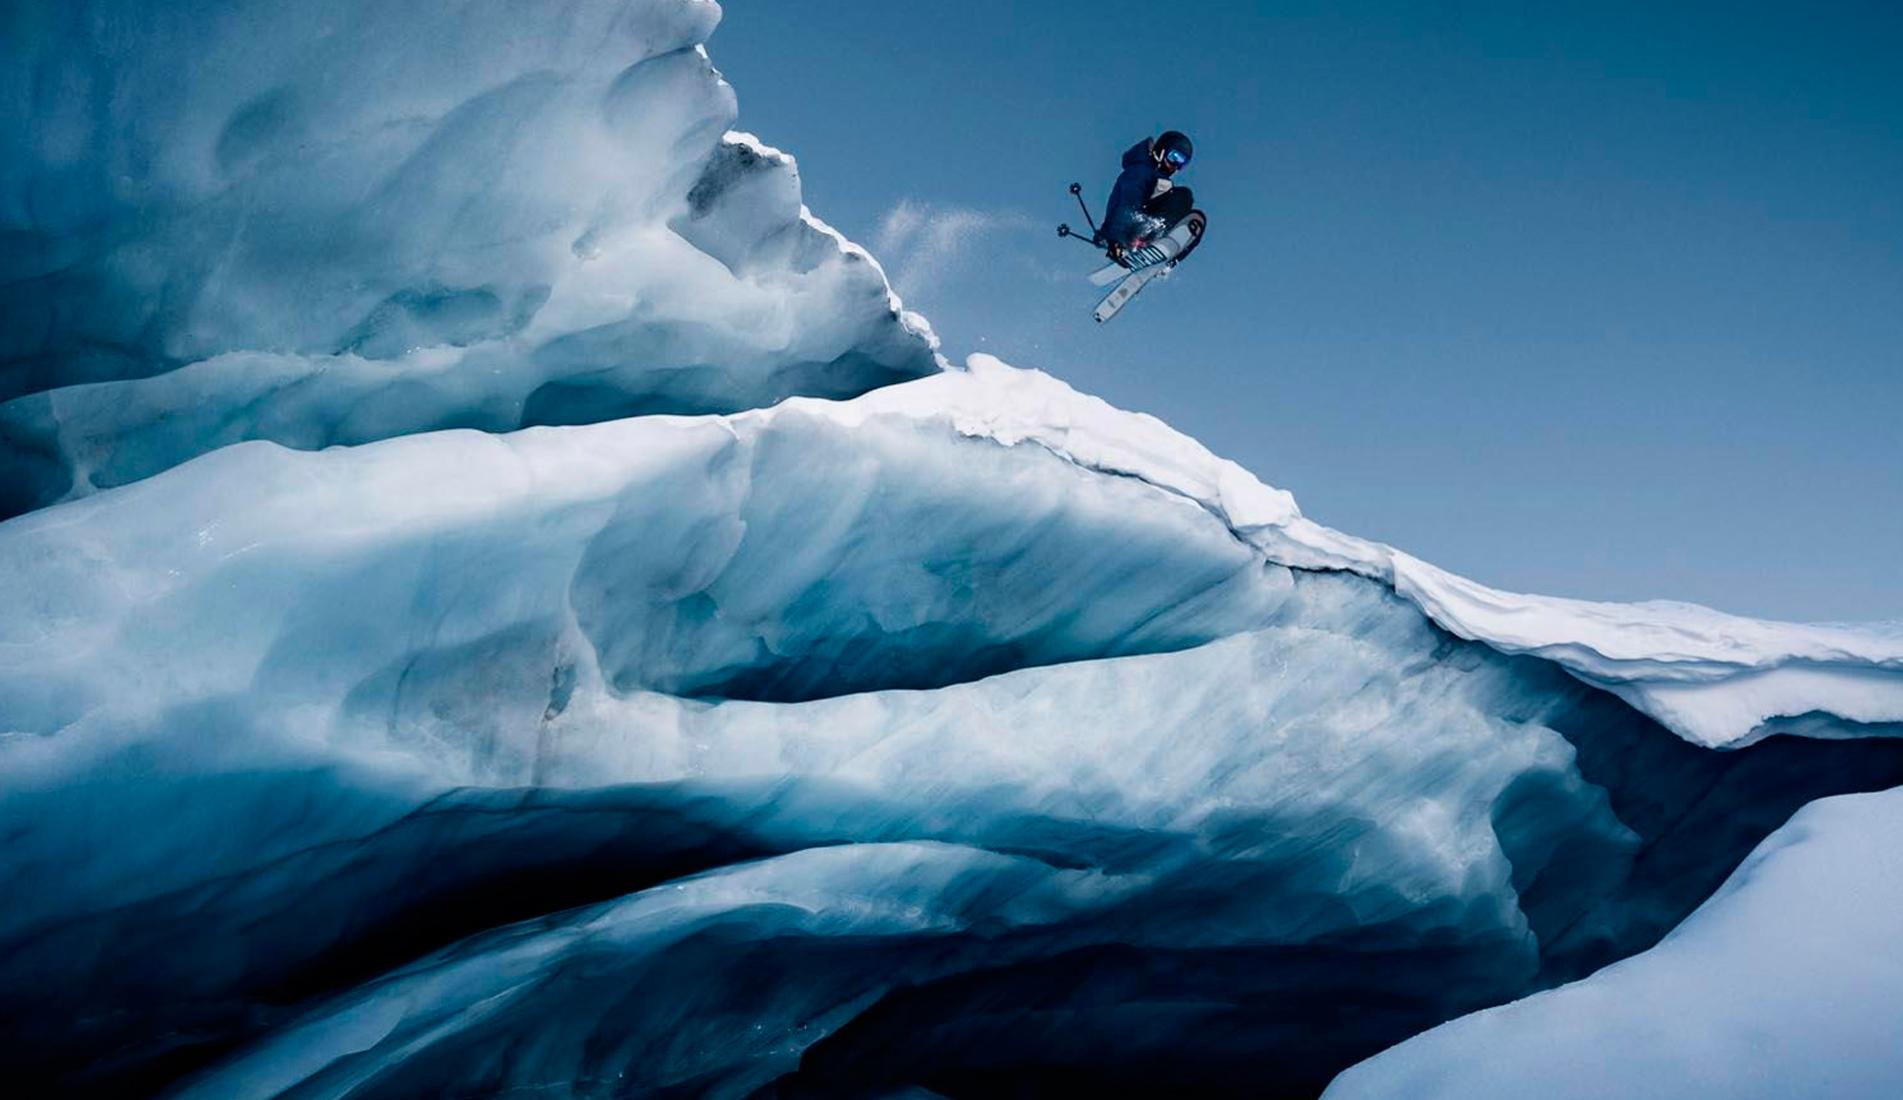 fotos-adrenalina-watersports-21